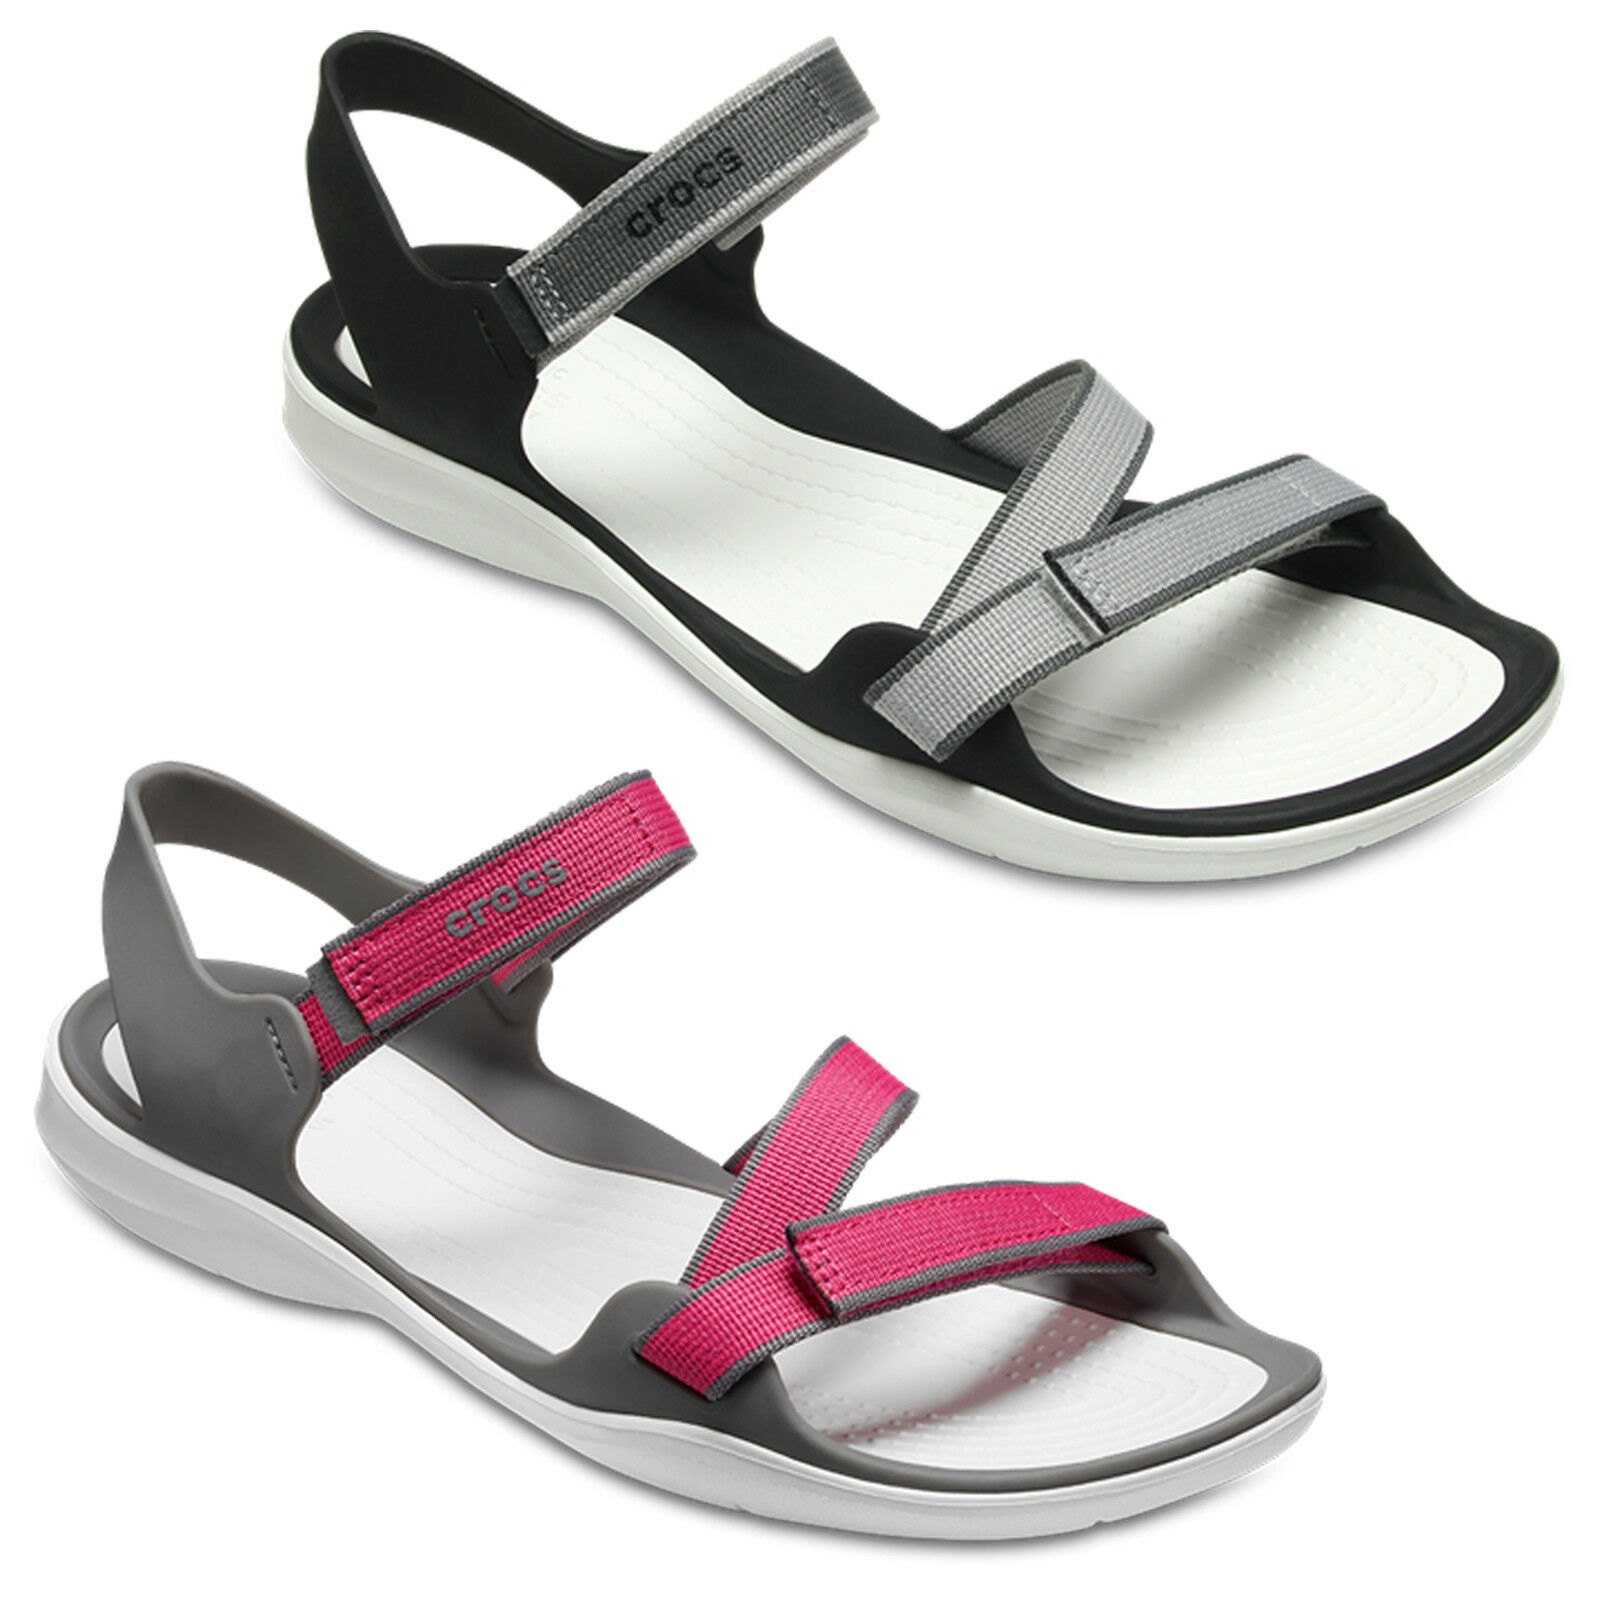 Crocs Swiftwater Gurtband Sandale Leicht Strand Sommer Urlaub Damen UK4-8